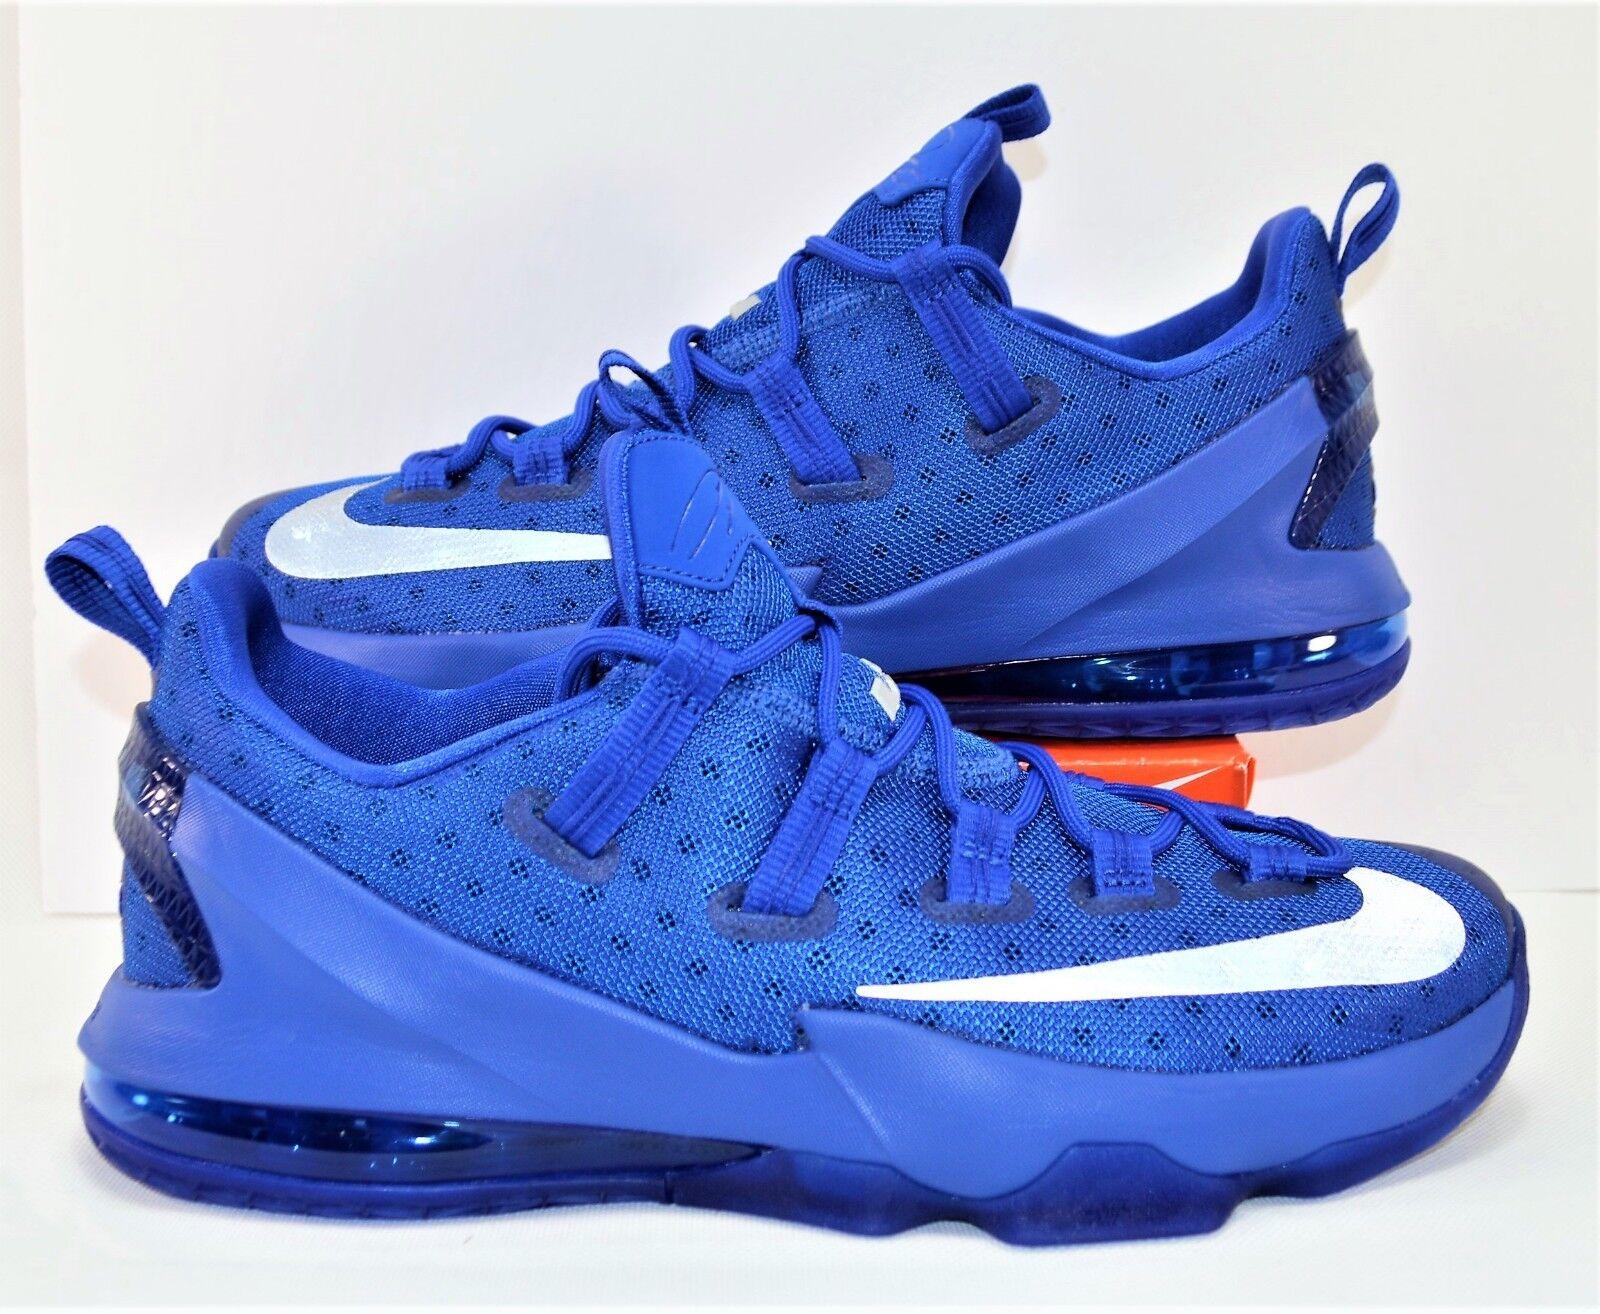 Nike LeBron 13 XIX II  Low Kentucky blu Basketball scarpe Sz 12 NEW 831925 400  basso prezzo del 40%